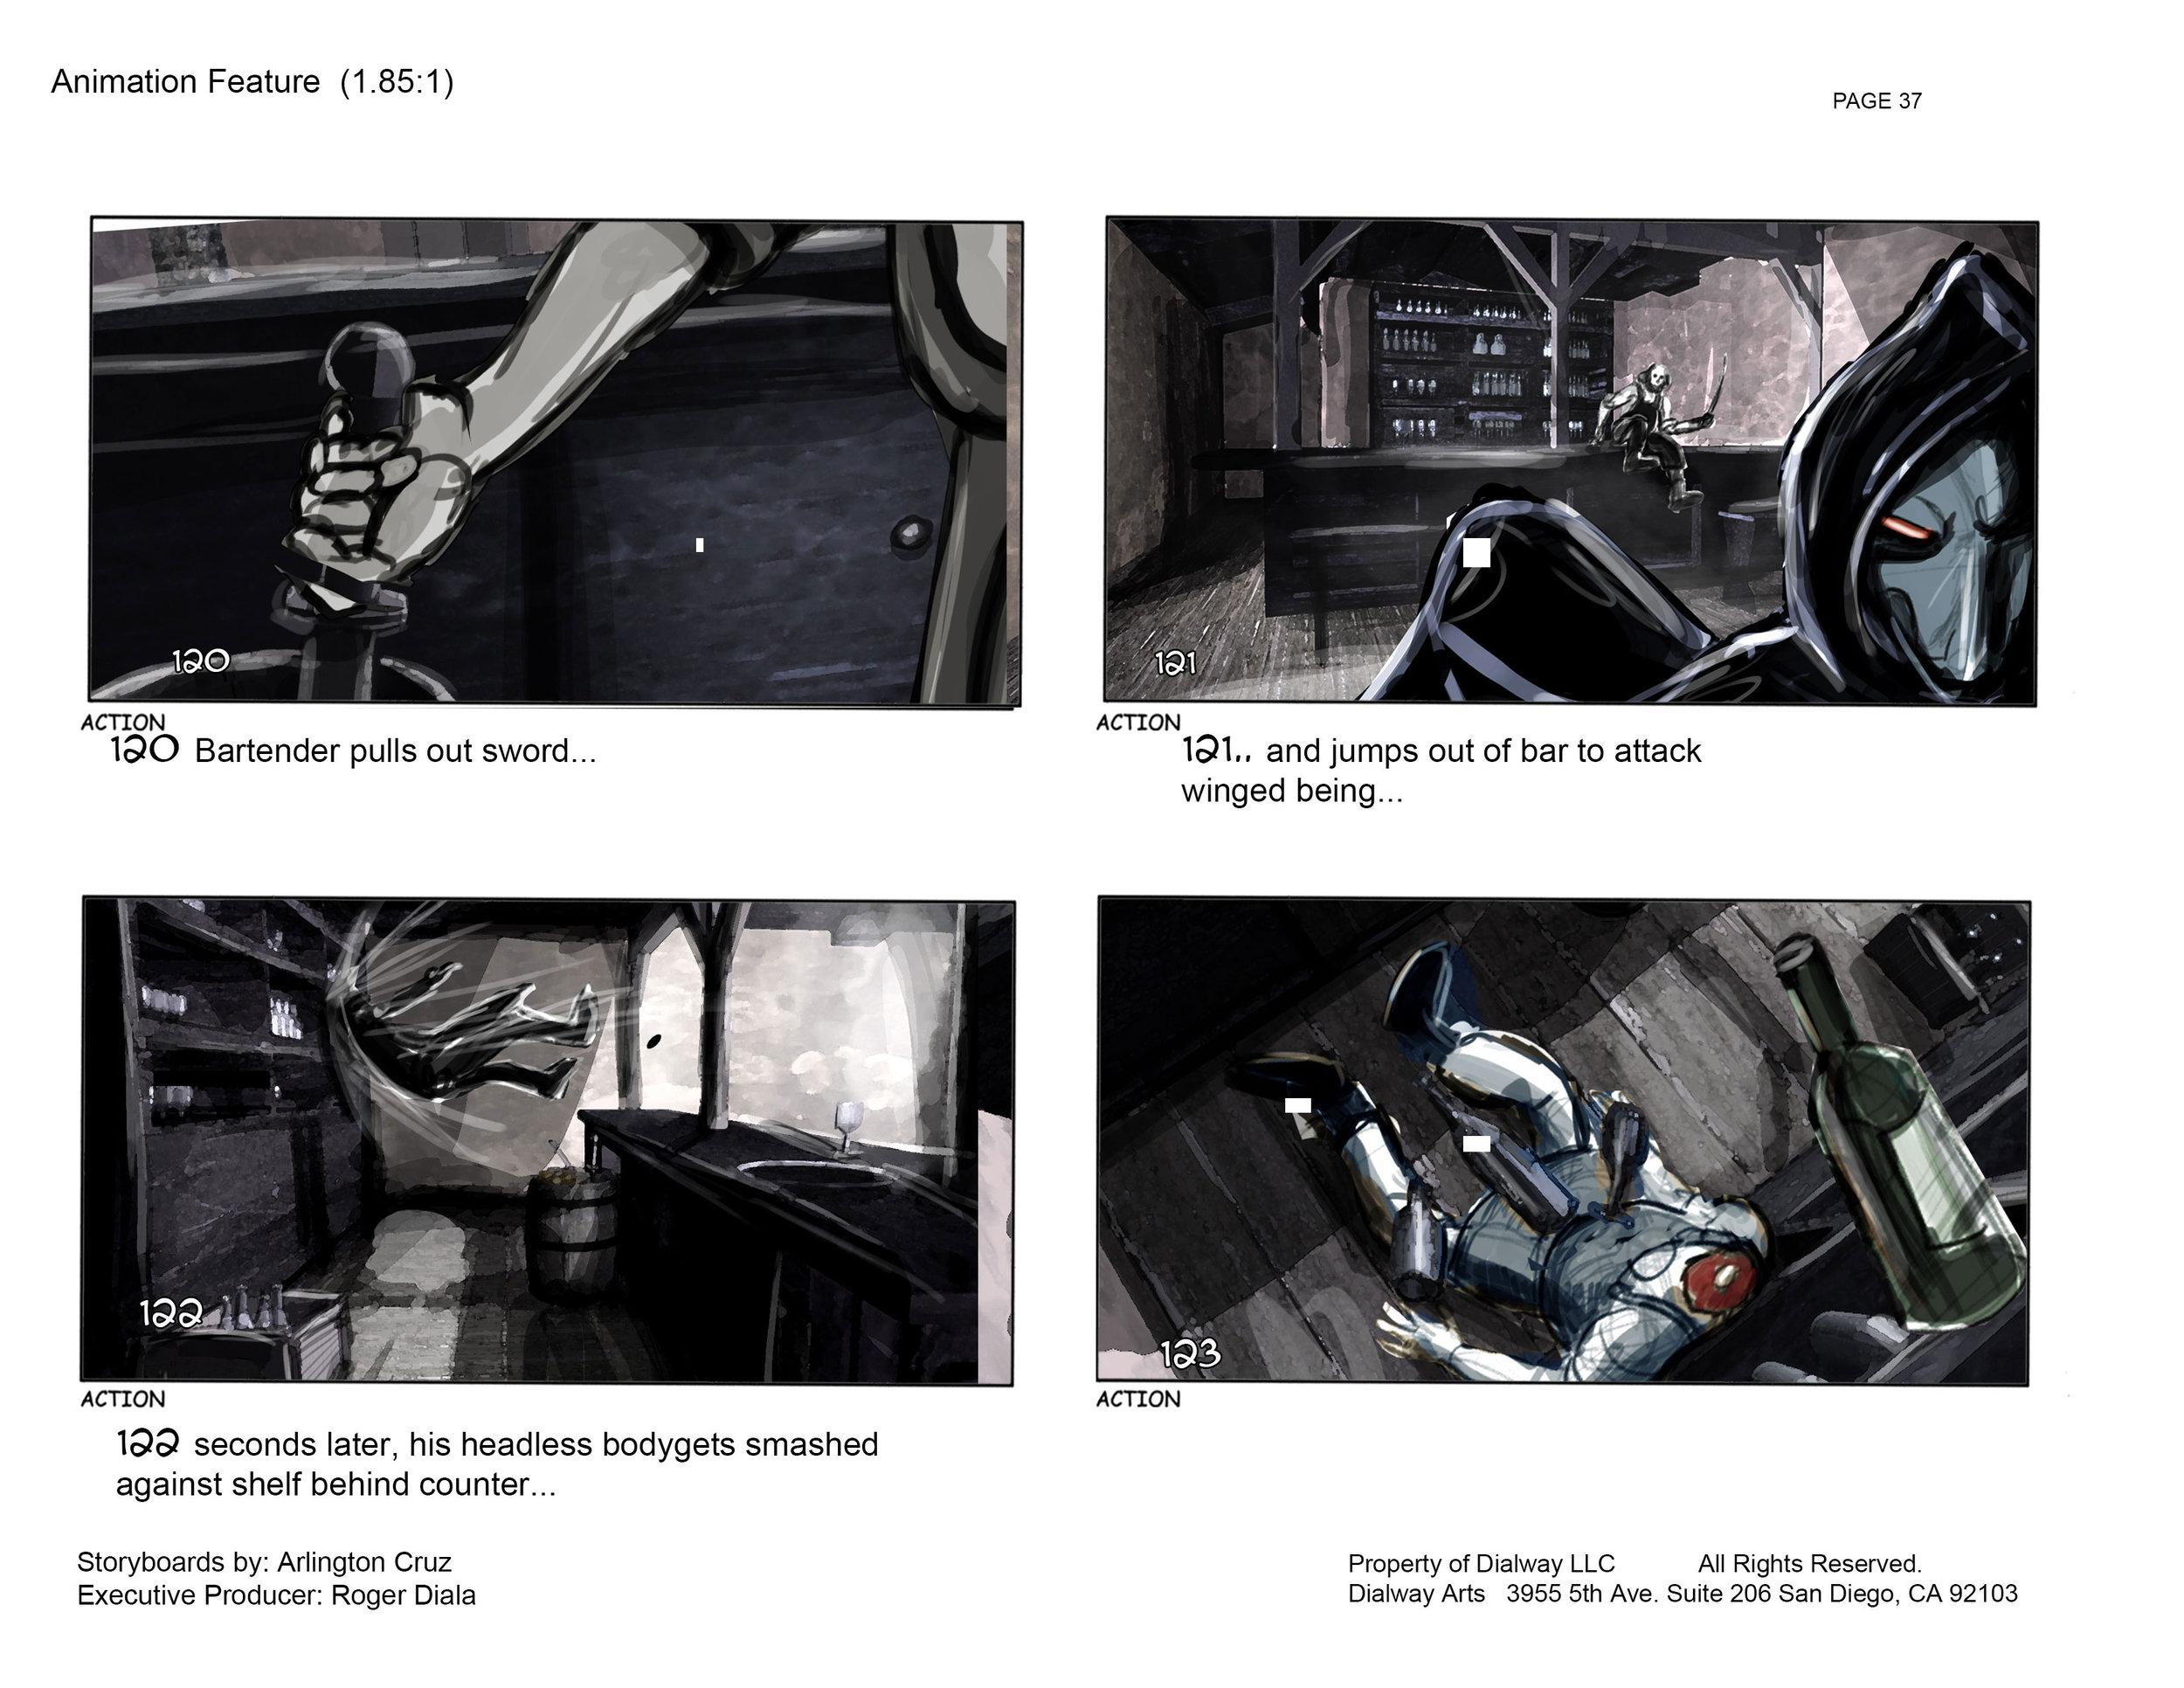 Storyboard4panelp37.jpg